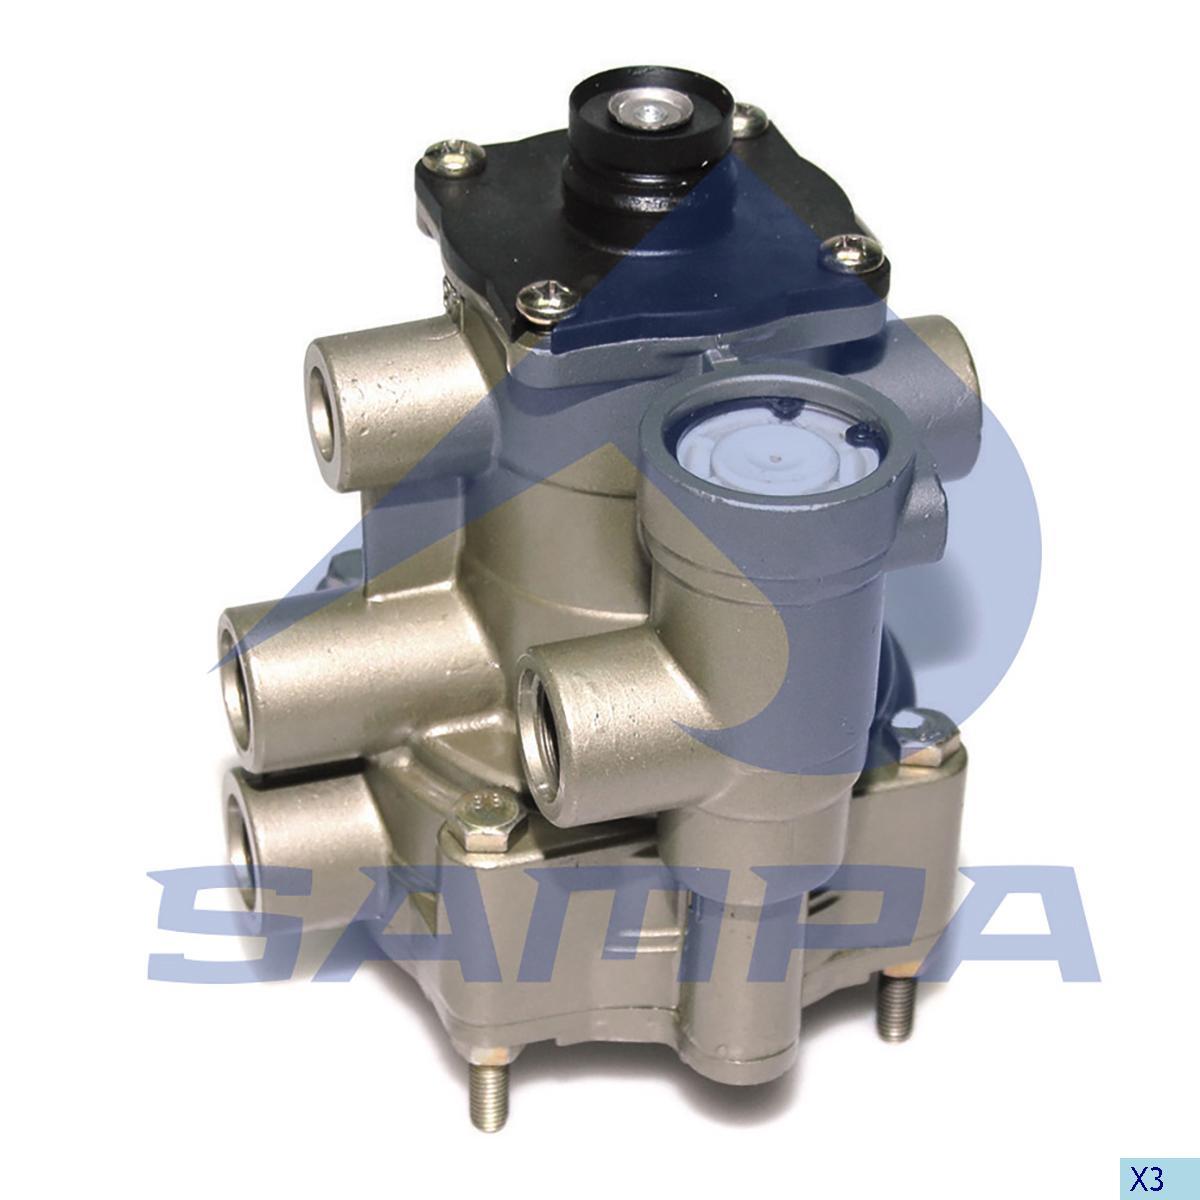 Pressure Control Valve, Daf, Compressed Air System